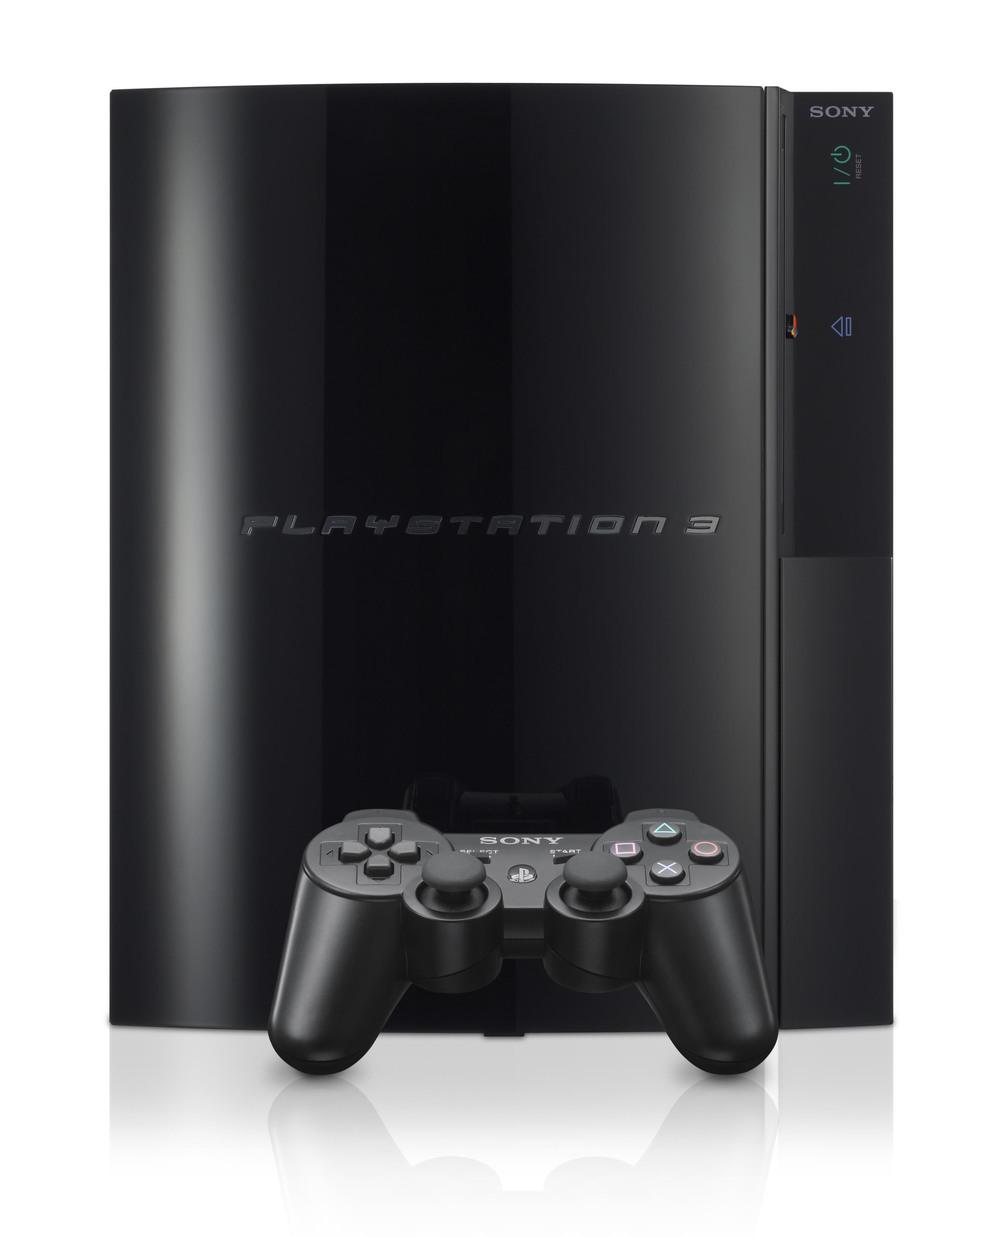 PS3 Front.jpg